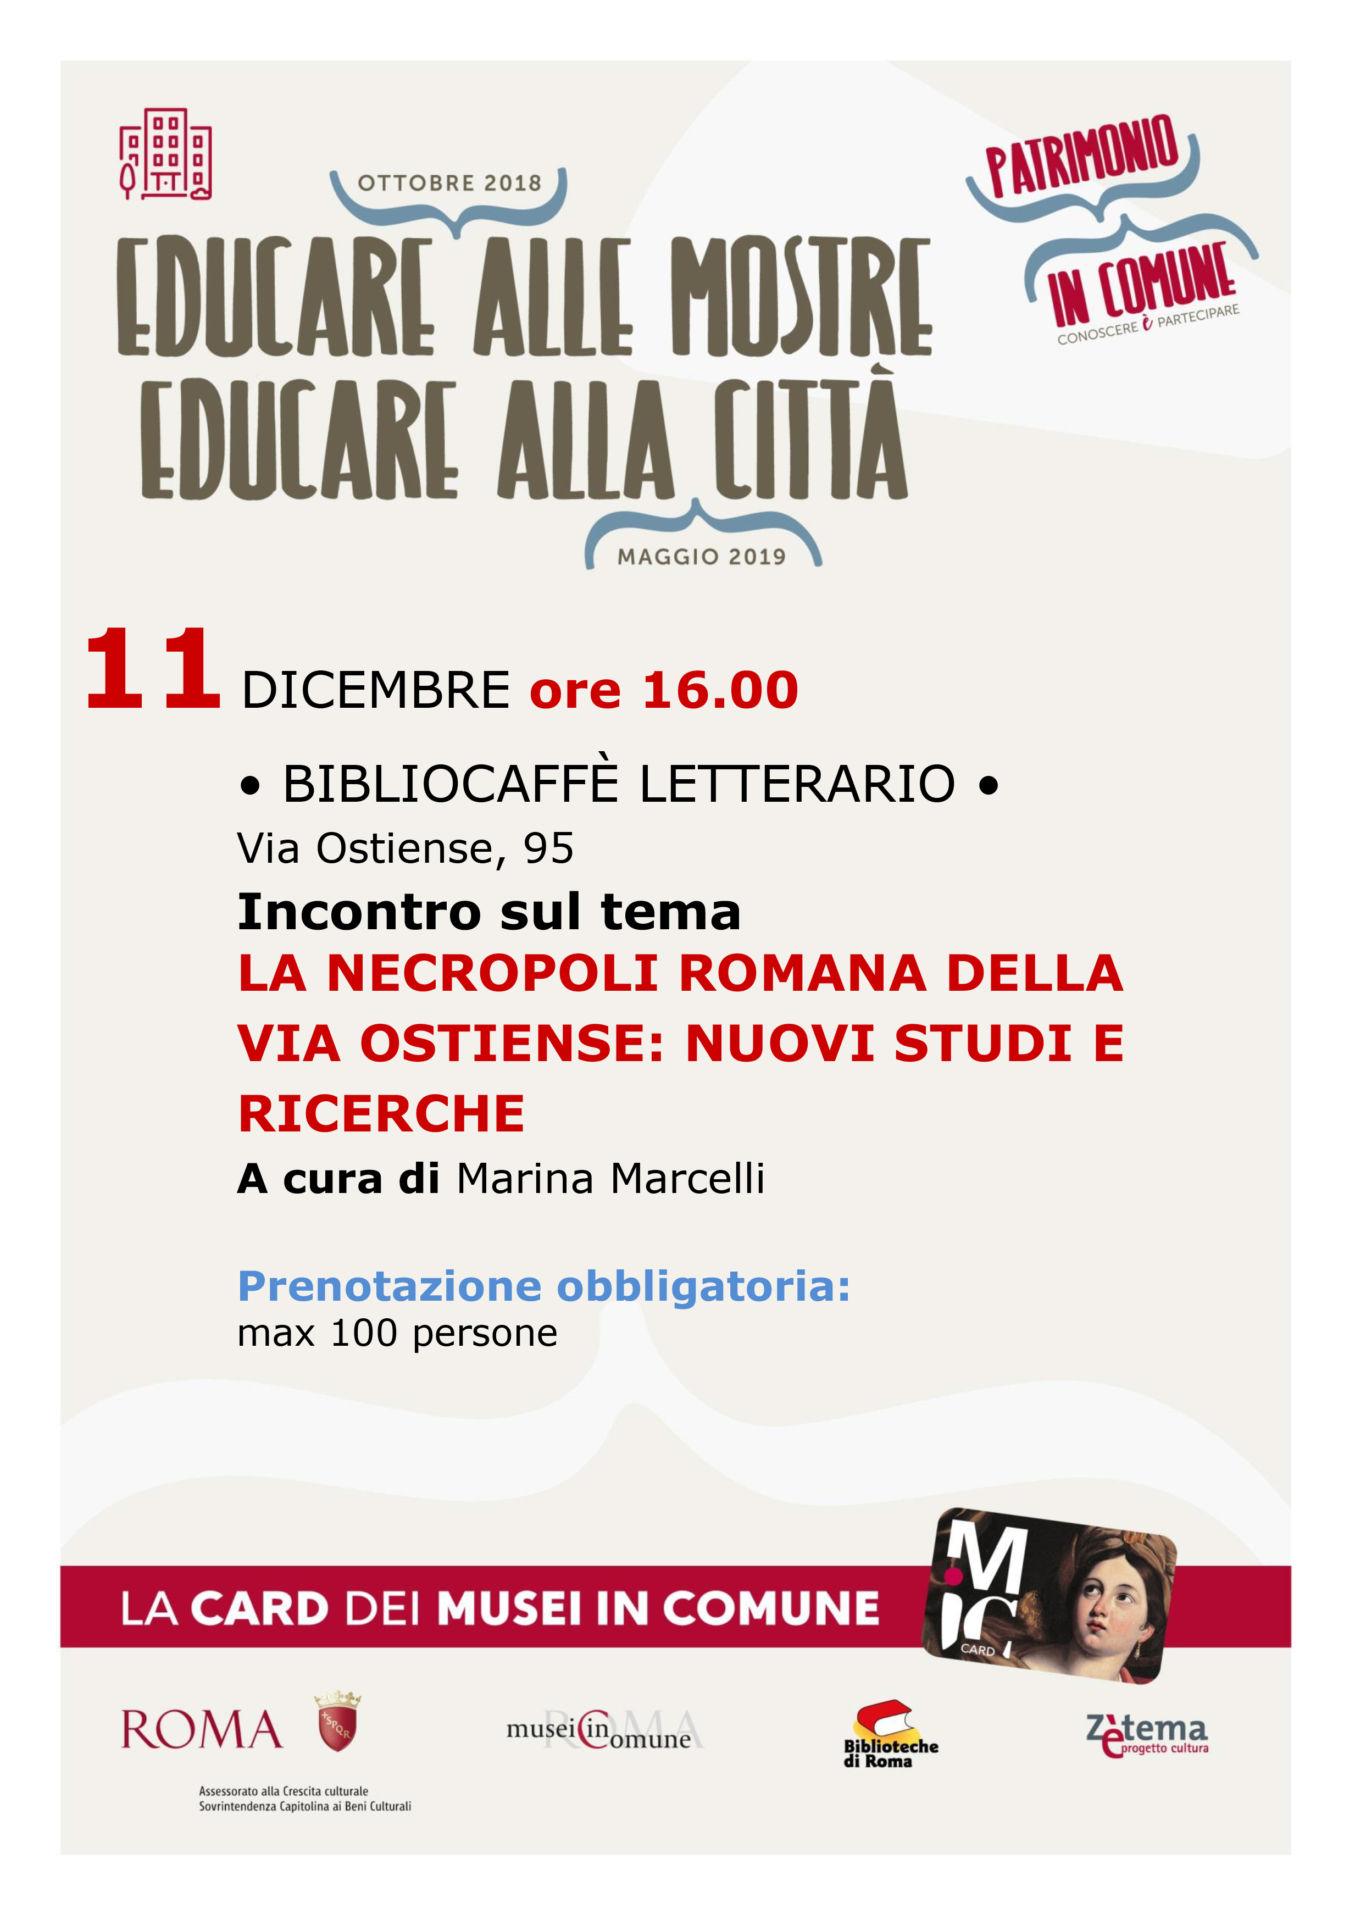 18_12_11_Locandina educare alle mostre_1